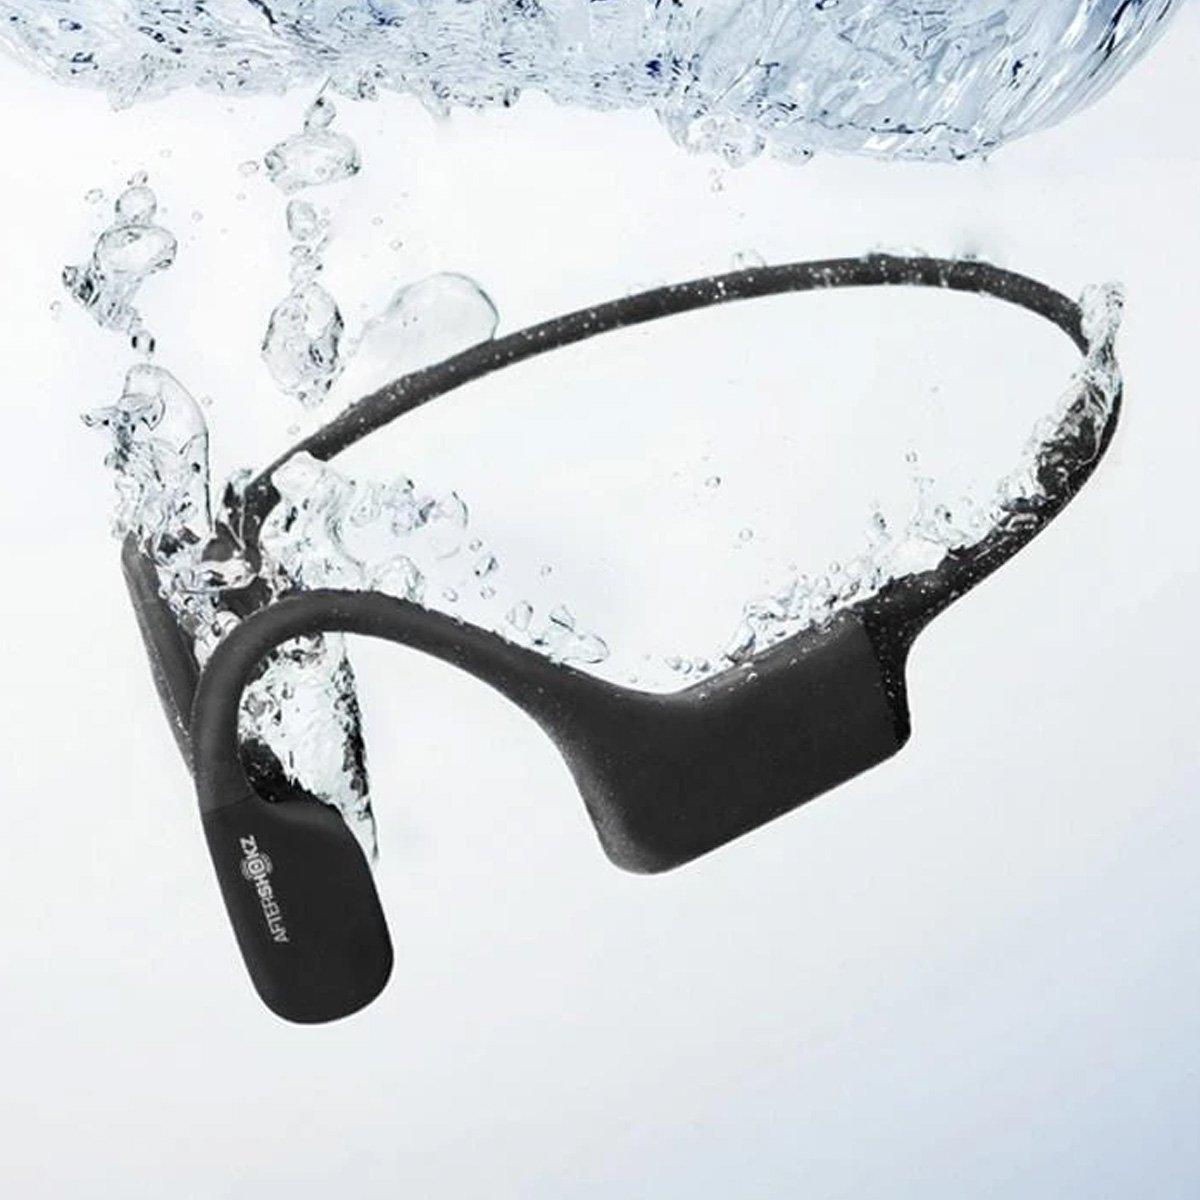 Aftershokz Xtrainerz MP3 Wireless Headphones